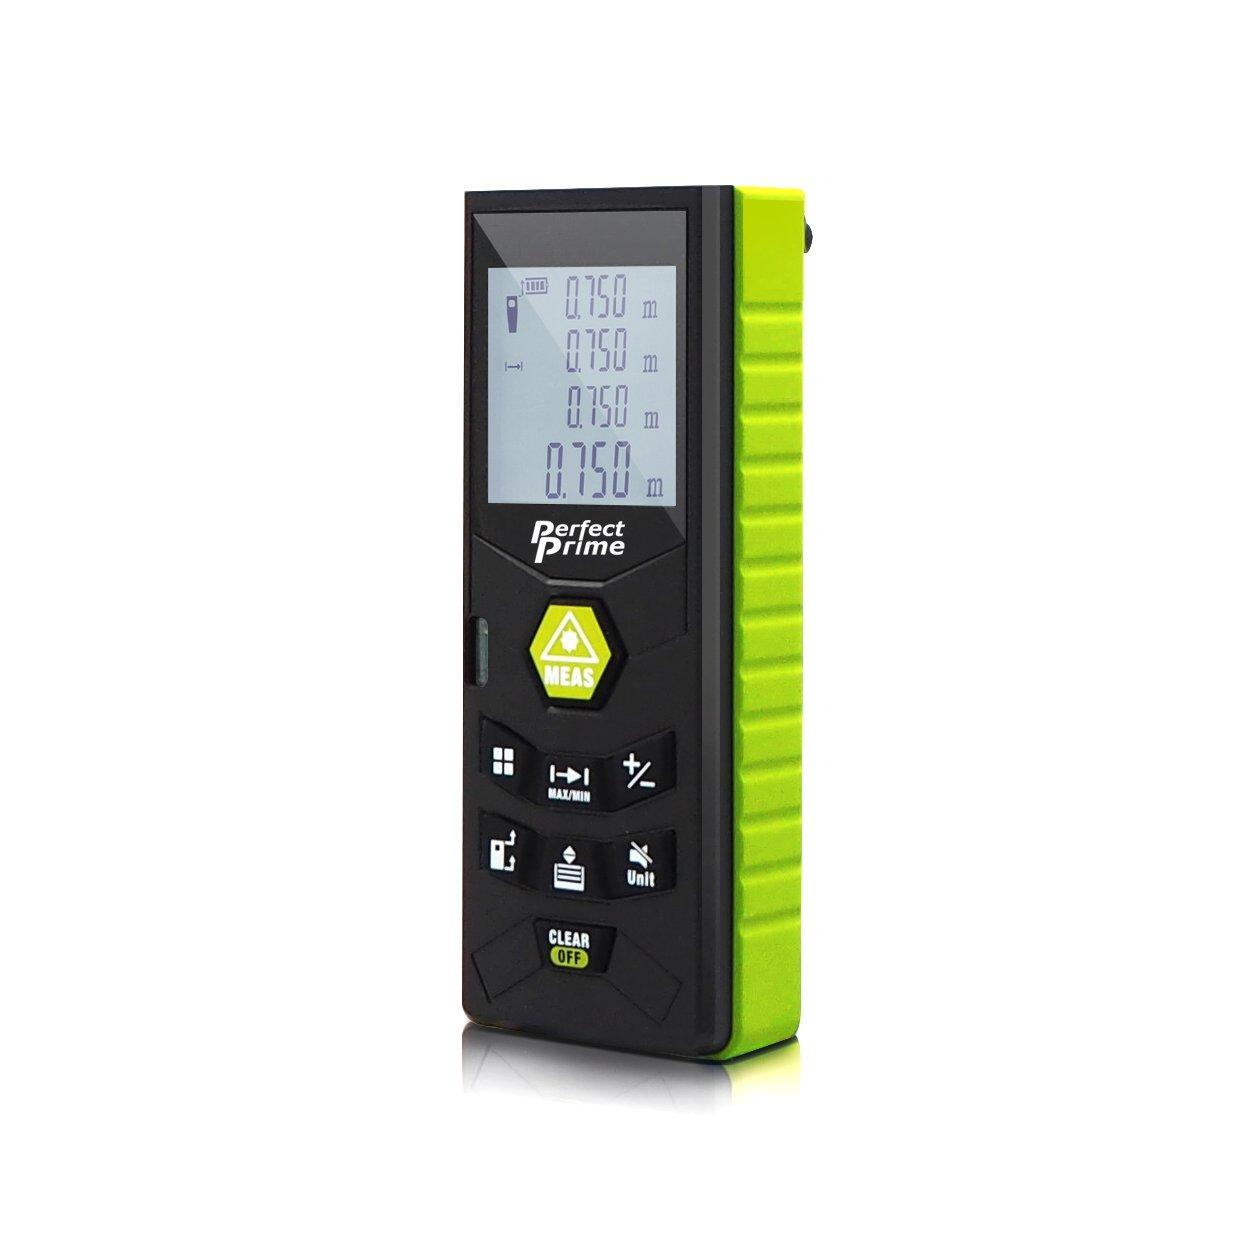 DAXGD Tel/émetro l/áser digital port/átil 40m con nivel de burbuja Rango de medici/ón de alta precisi/ón y gran pantalla LCD retroiluminada para medir distancia /área y volumen